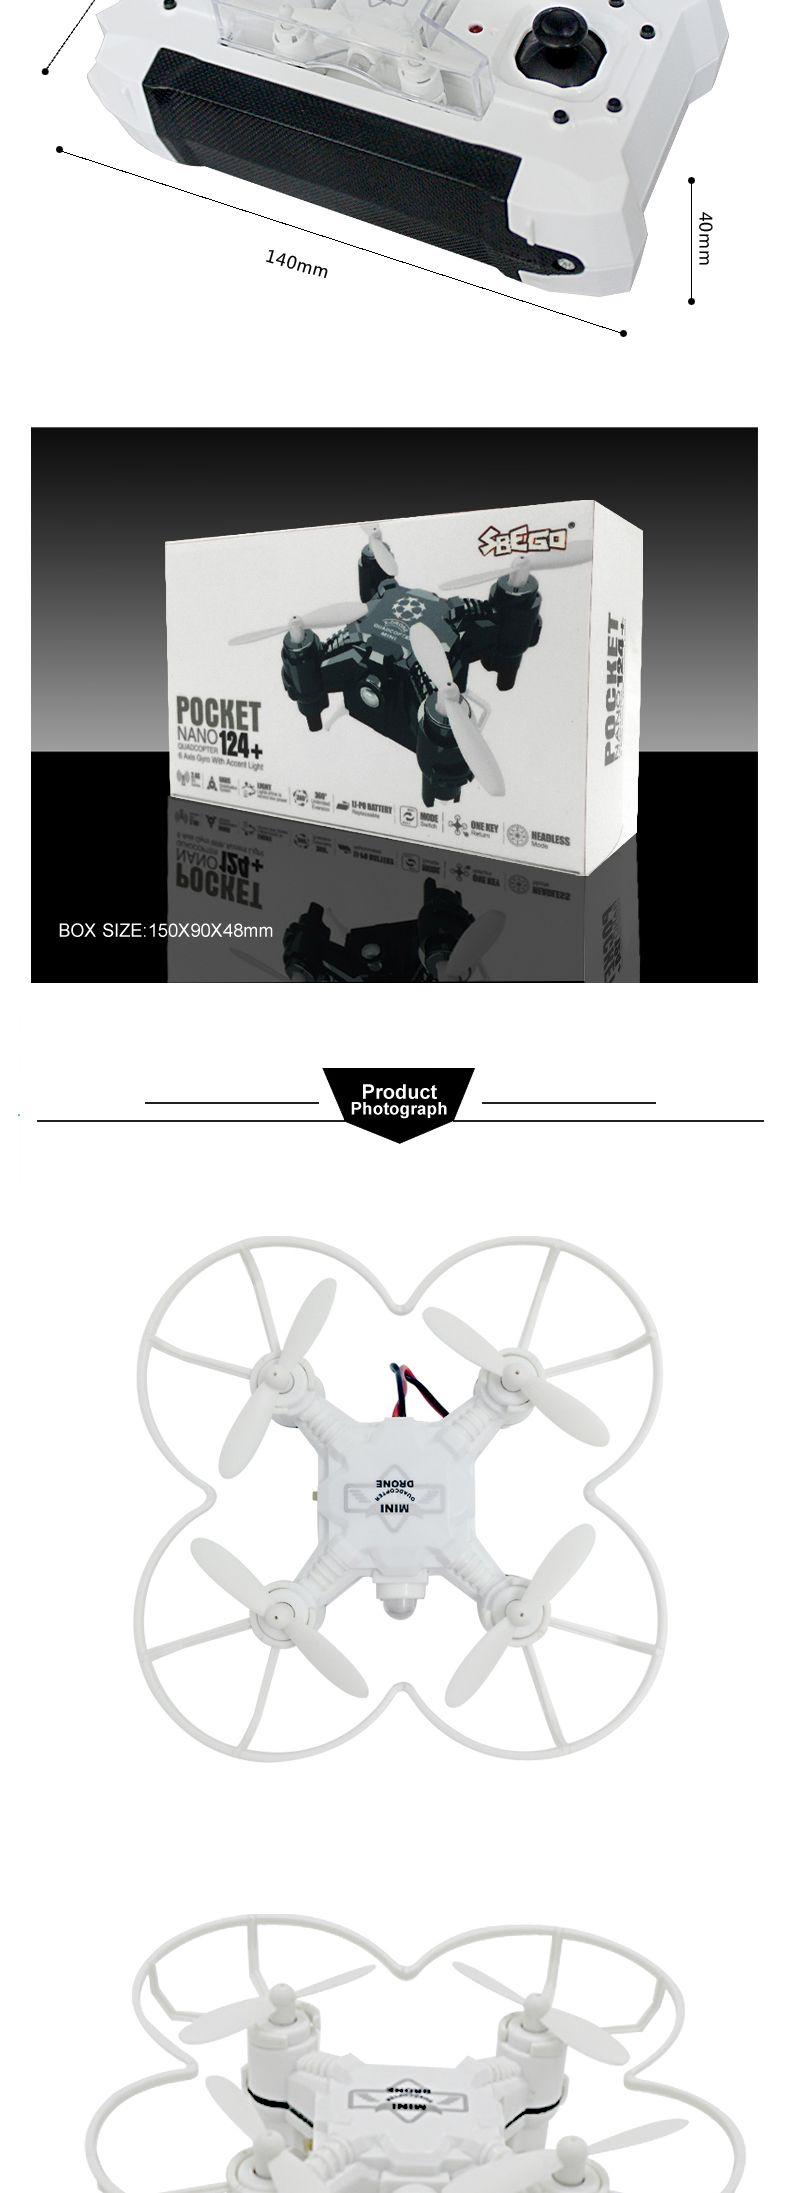 sbego pocket drone 124 manual